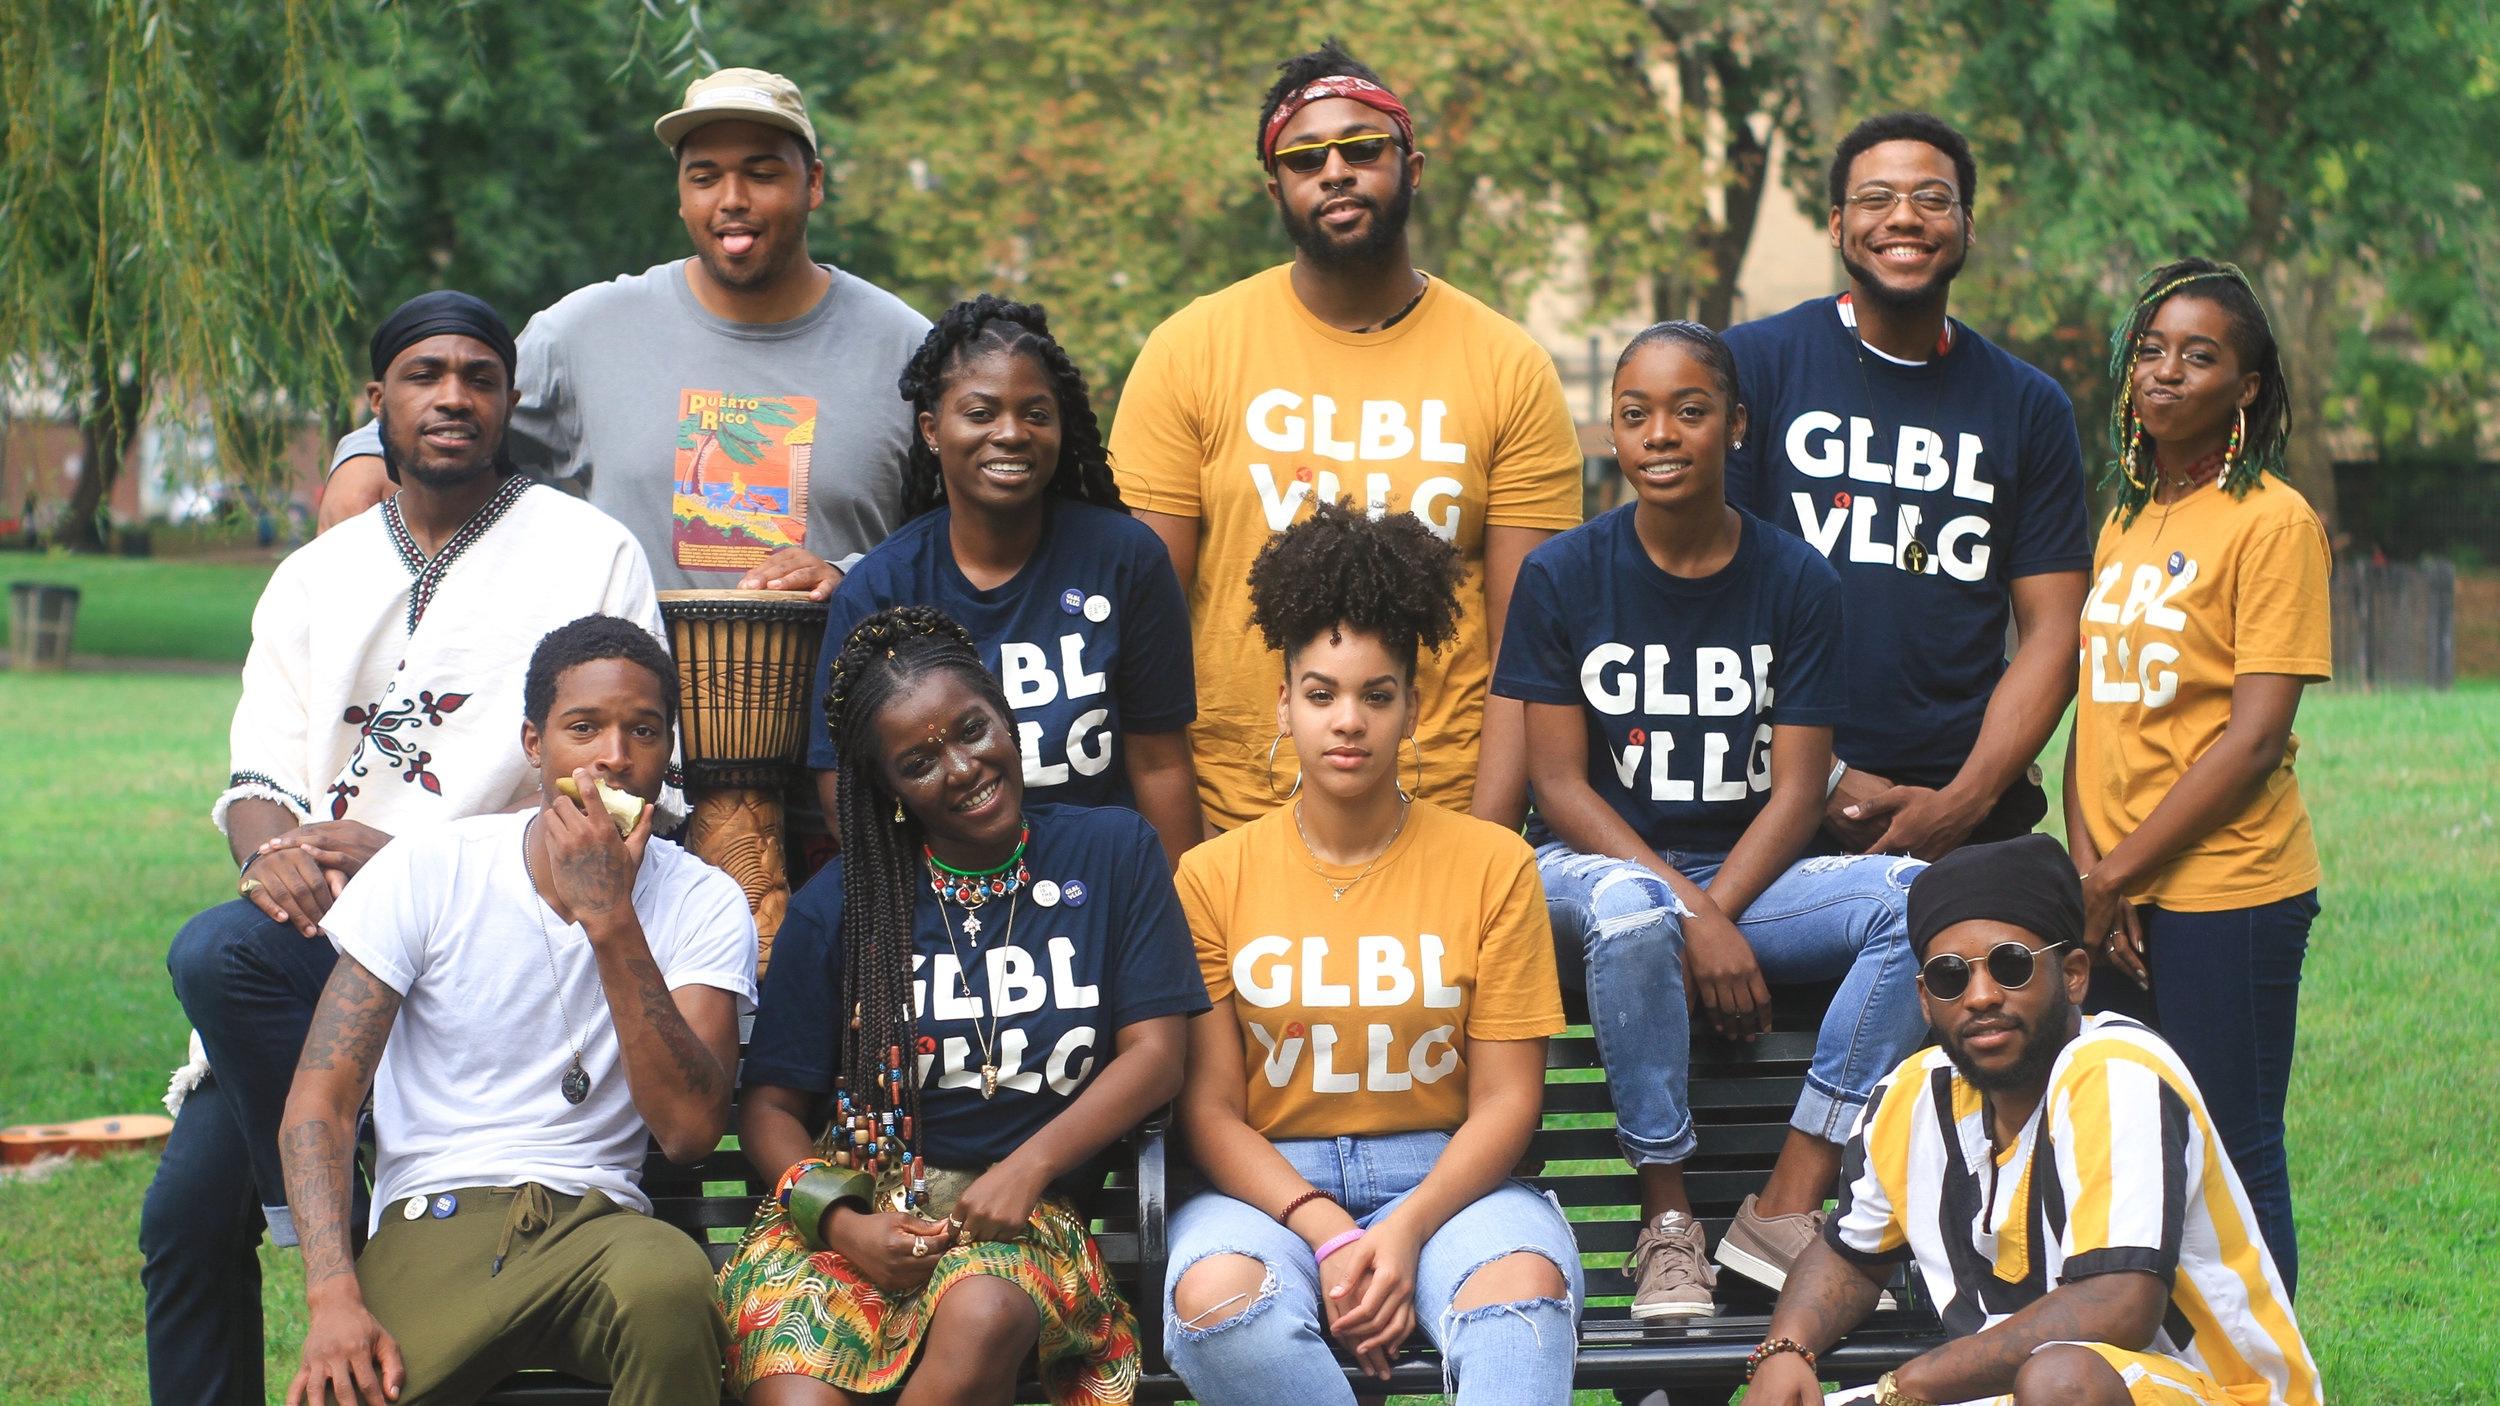 CIC Philadelphia member GLBL VLLG is expanding its urban wellness and creativity programs worldwide.